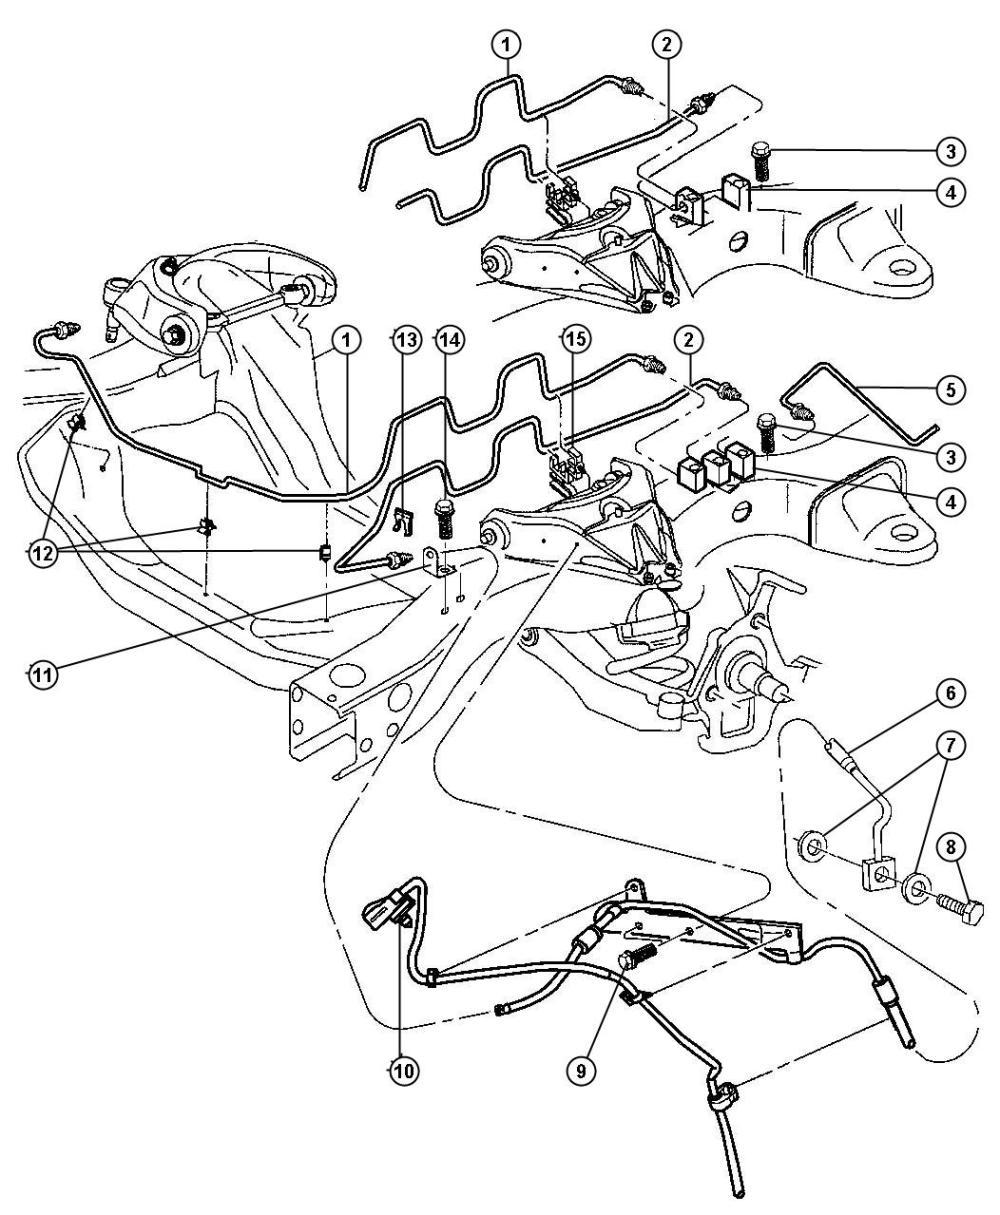 medium resolution of ship wiring diagram symbols moreover dodge dakota brake system 2000 dodge dakota vacuum line diagram new